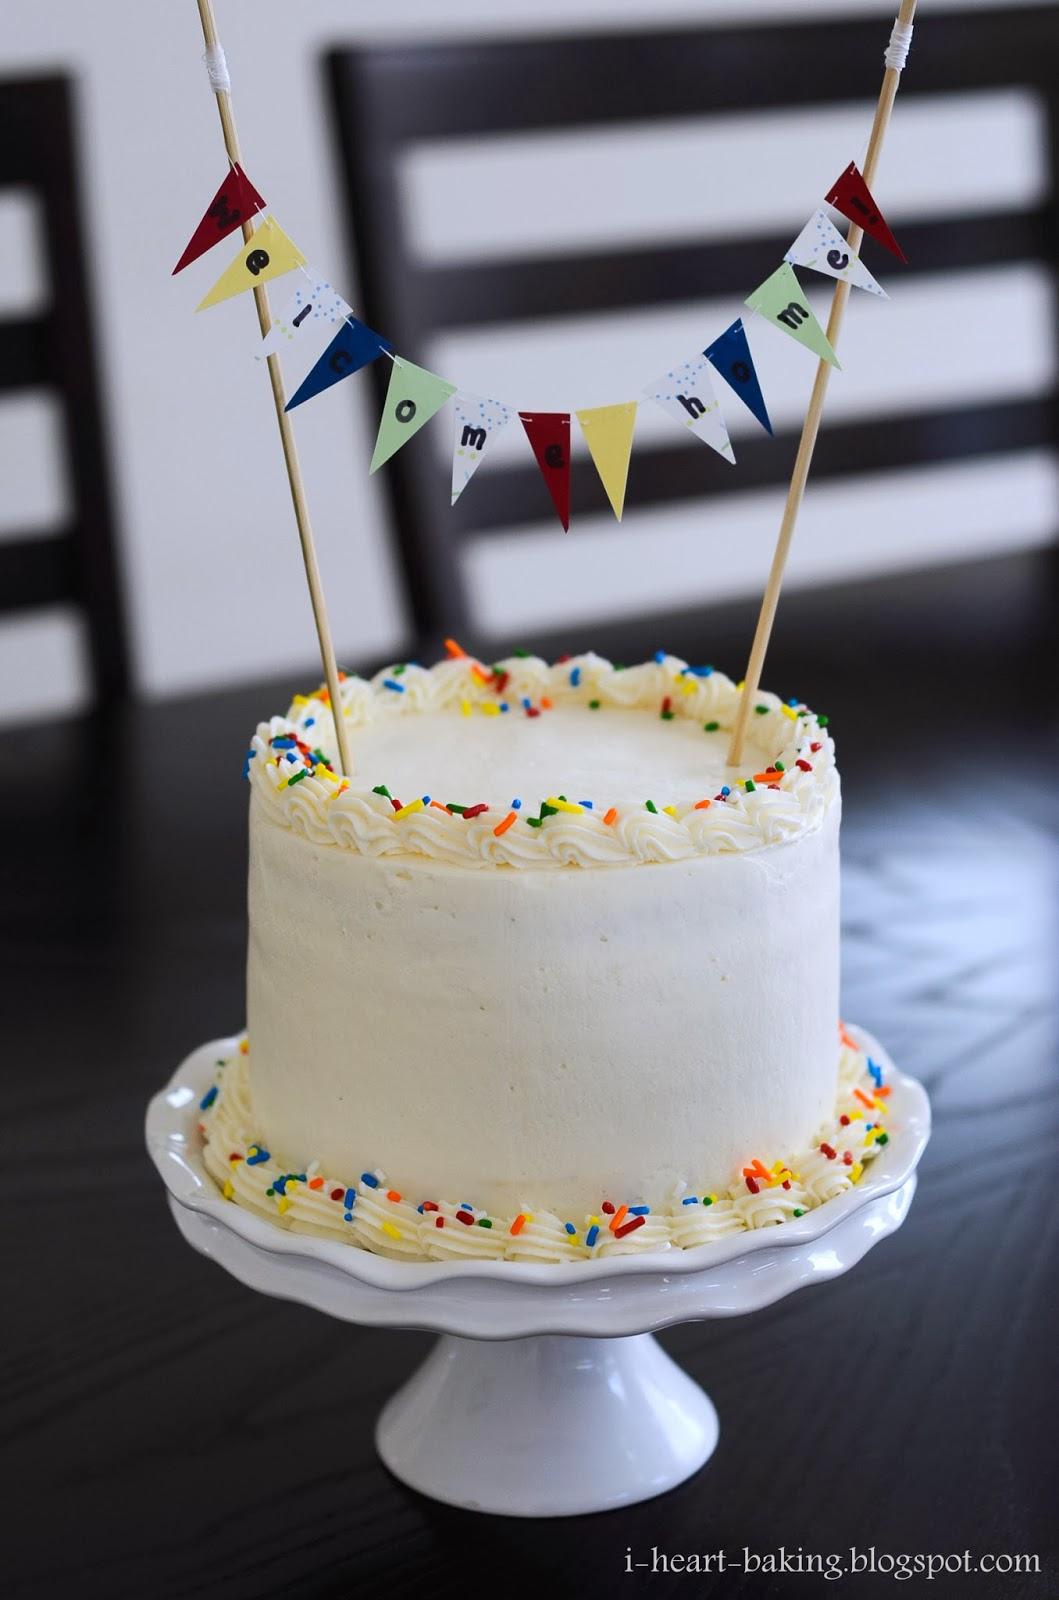 i heart baking!: funfetti welcome home cake with handmade ...